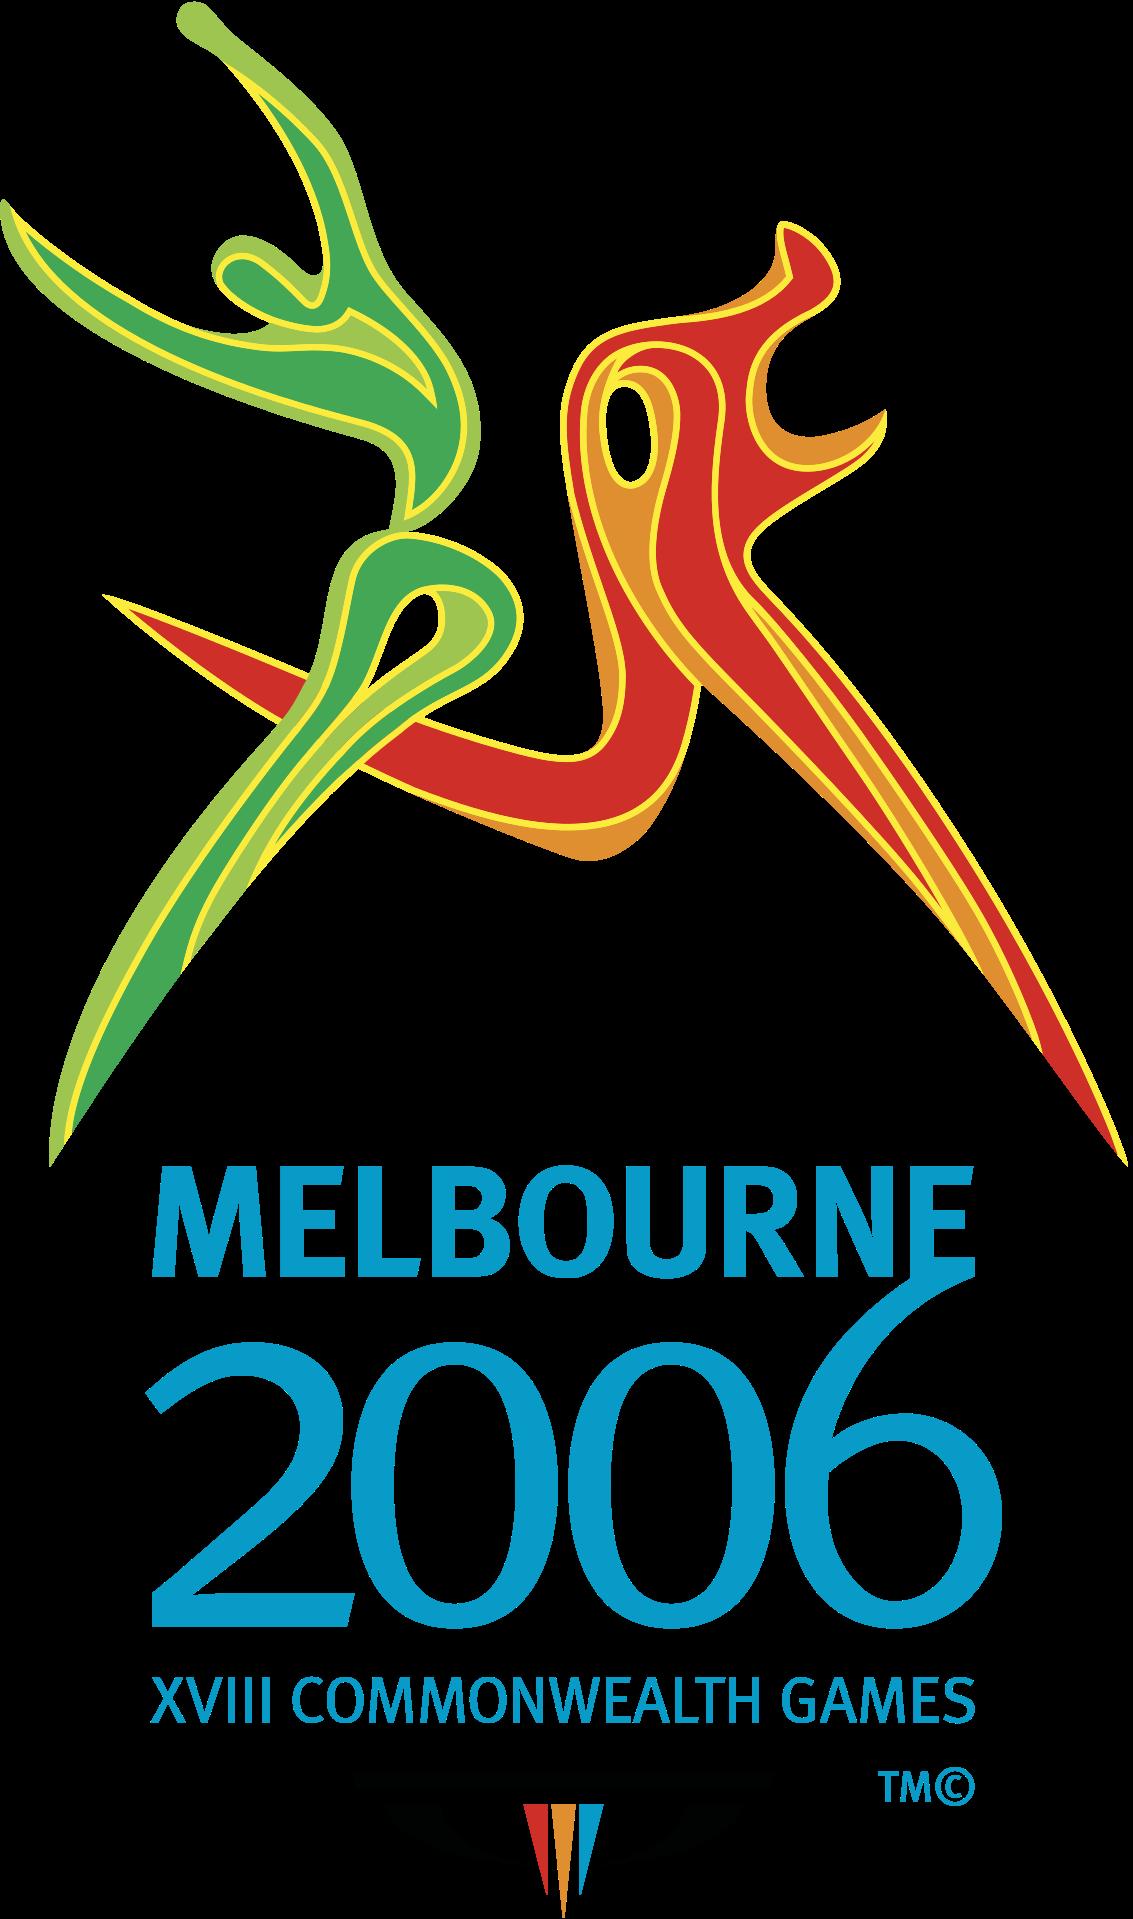 2006 commonwealth games melbourne logo